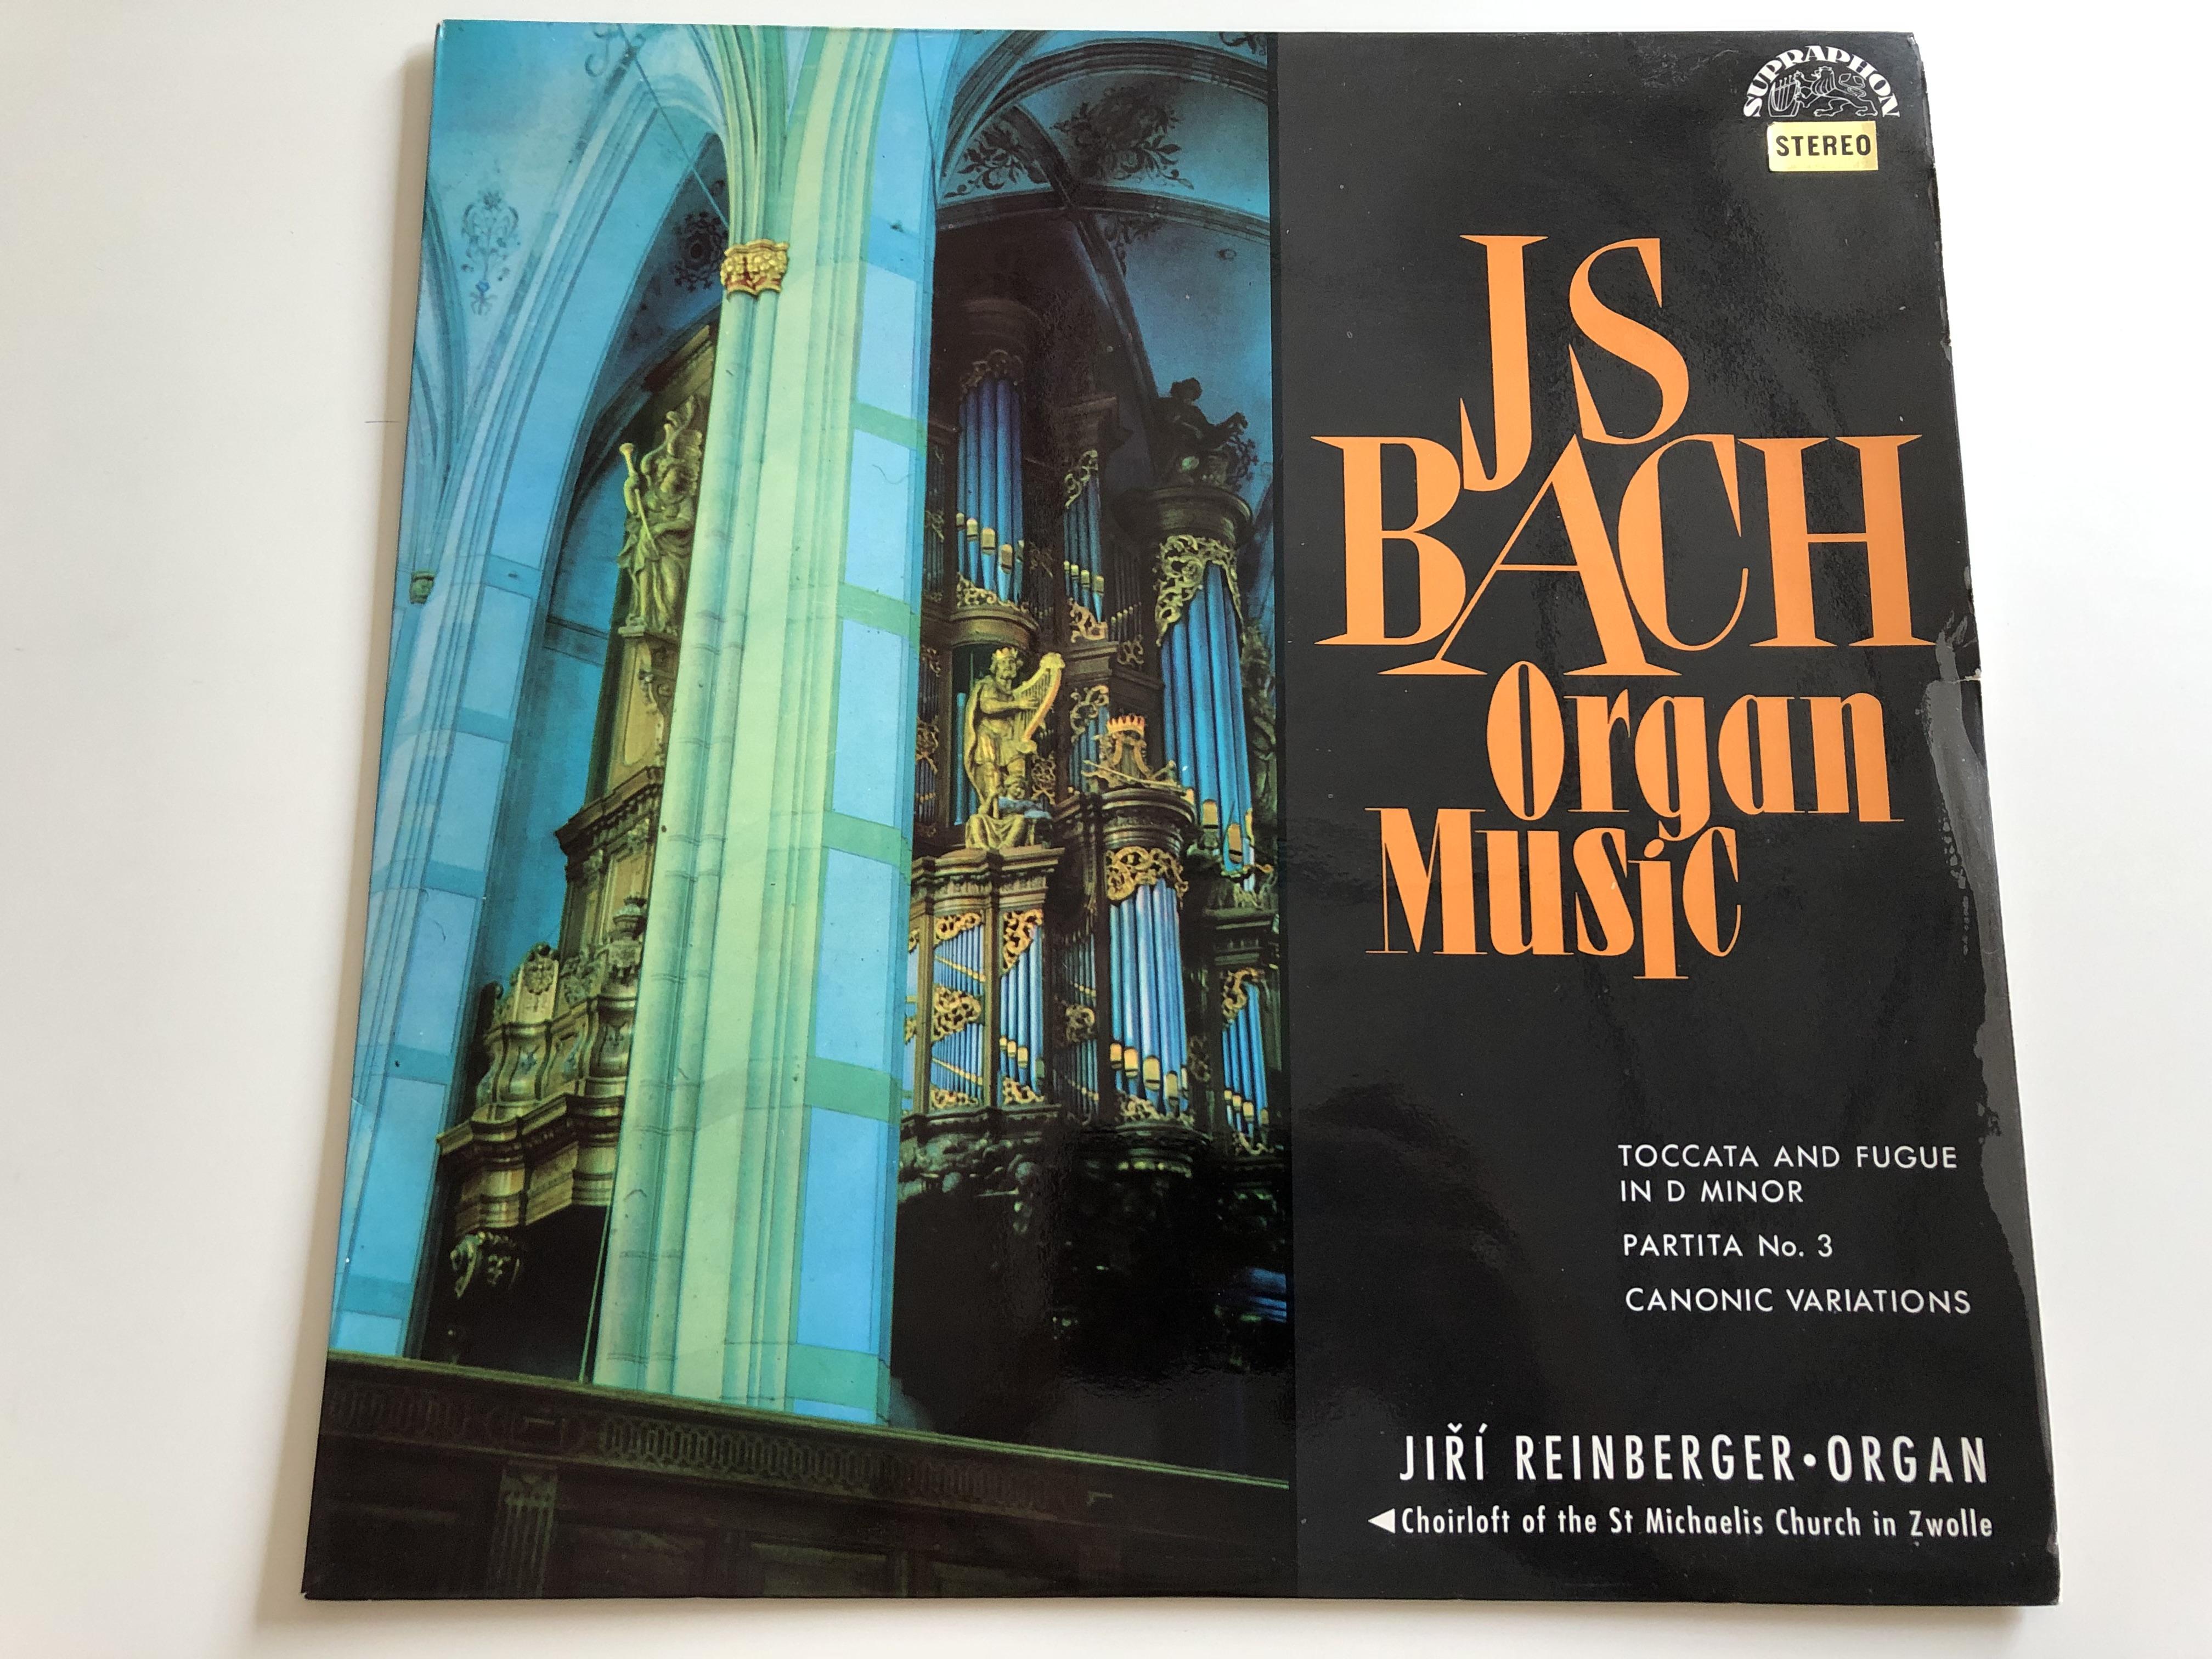 j-s-bach-organ-music-toccata-and-fugue-in-d-minor-partita-no.3-canonic-variations-ji-reinberger-supraphon-lp-stereo-sua-st-50490-sua-10490-1-.jpg